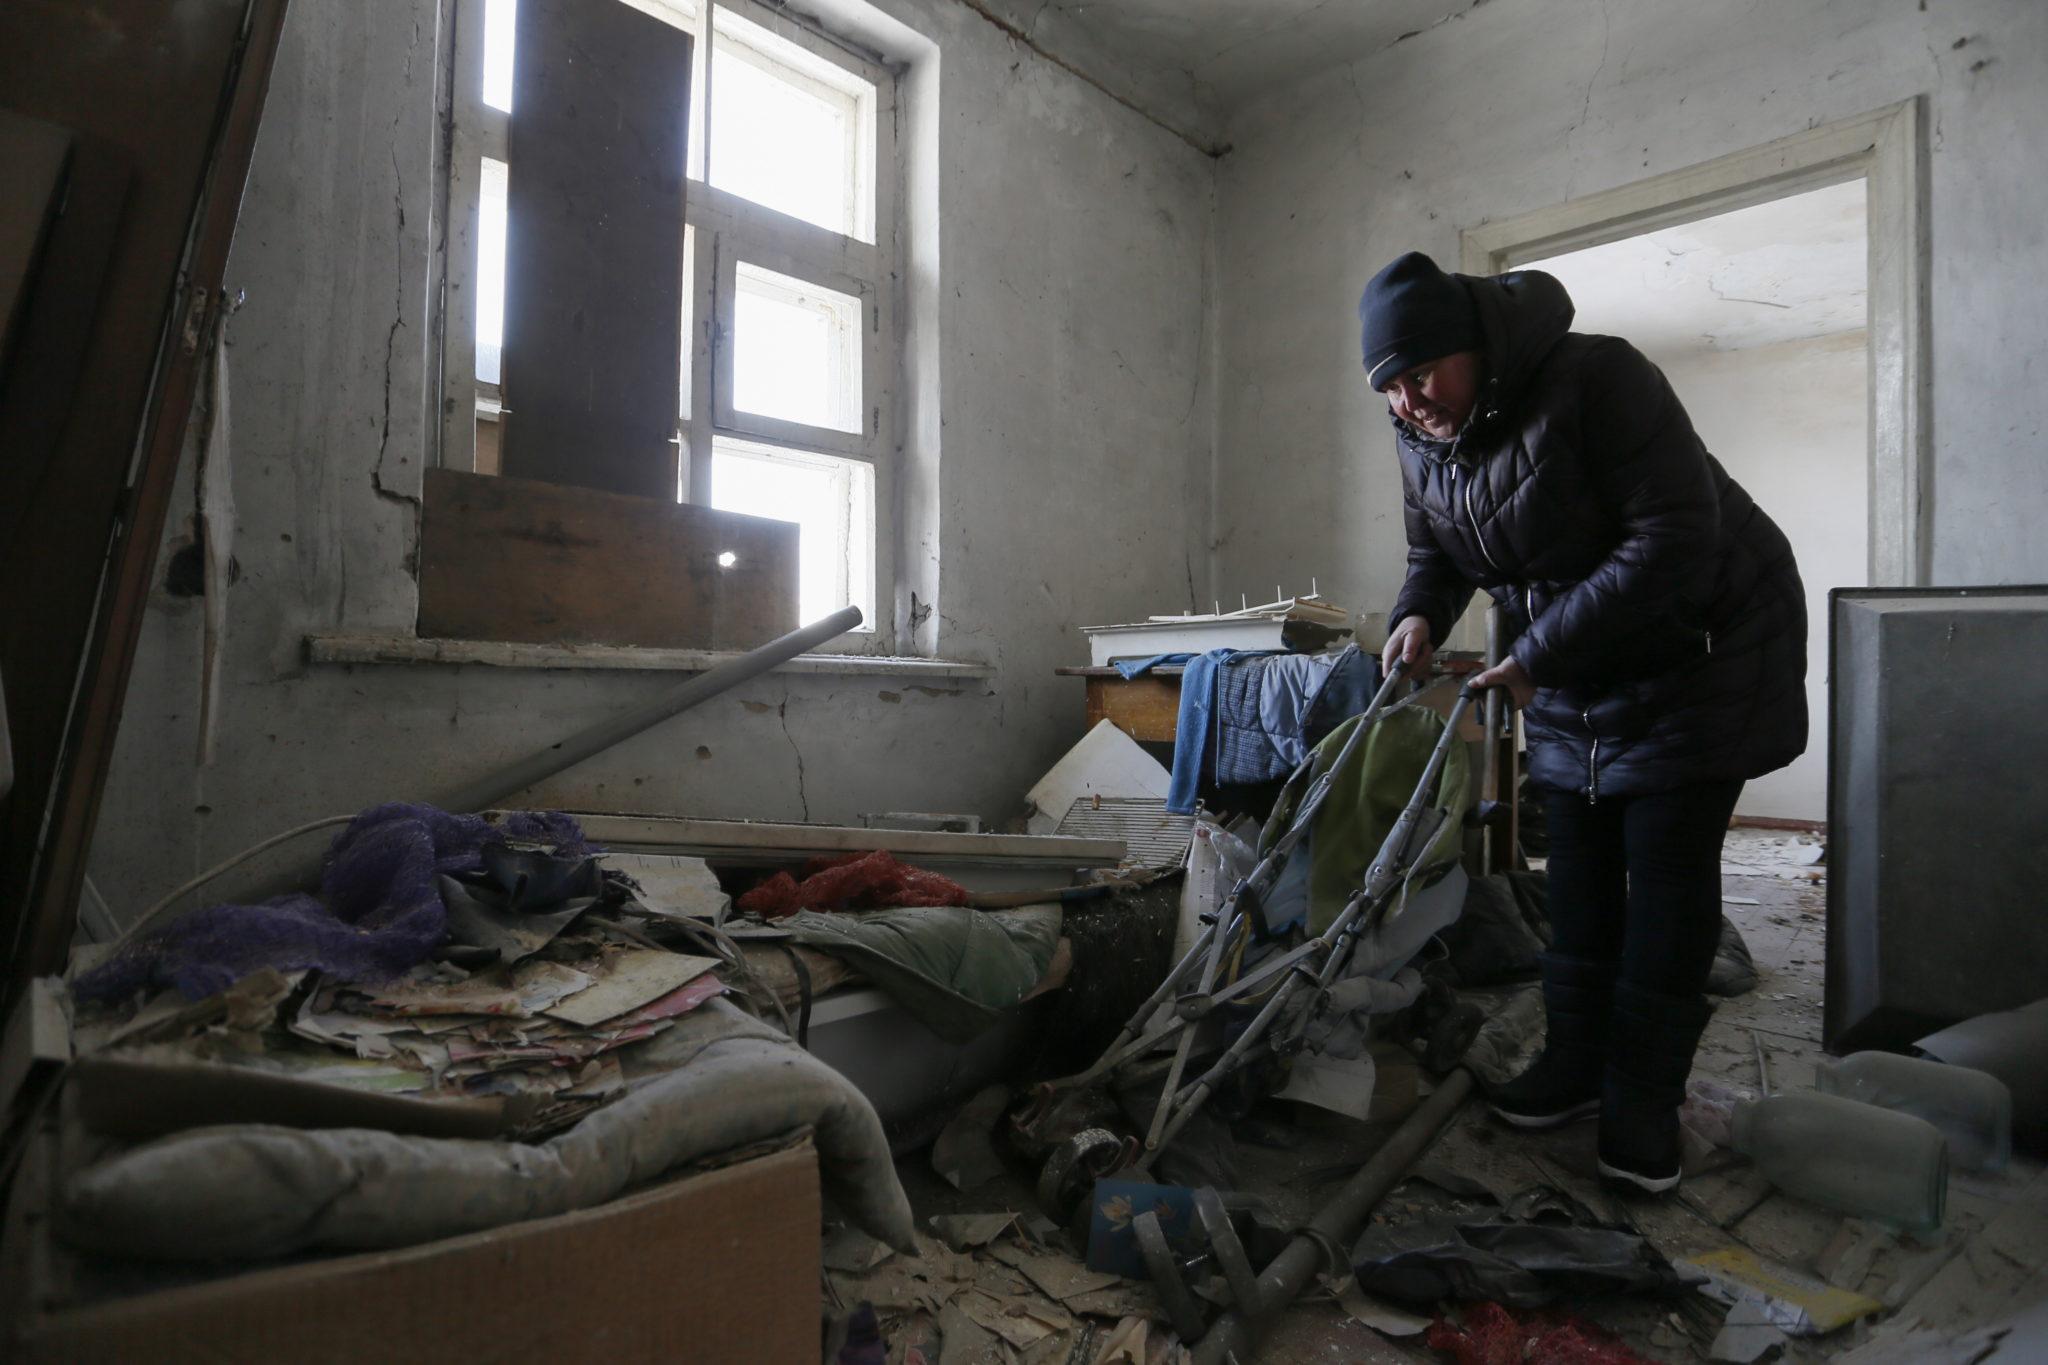 Bieda na Ukrainie. Fot. EPA/DAVE MUSTAINE